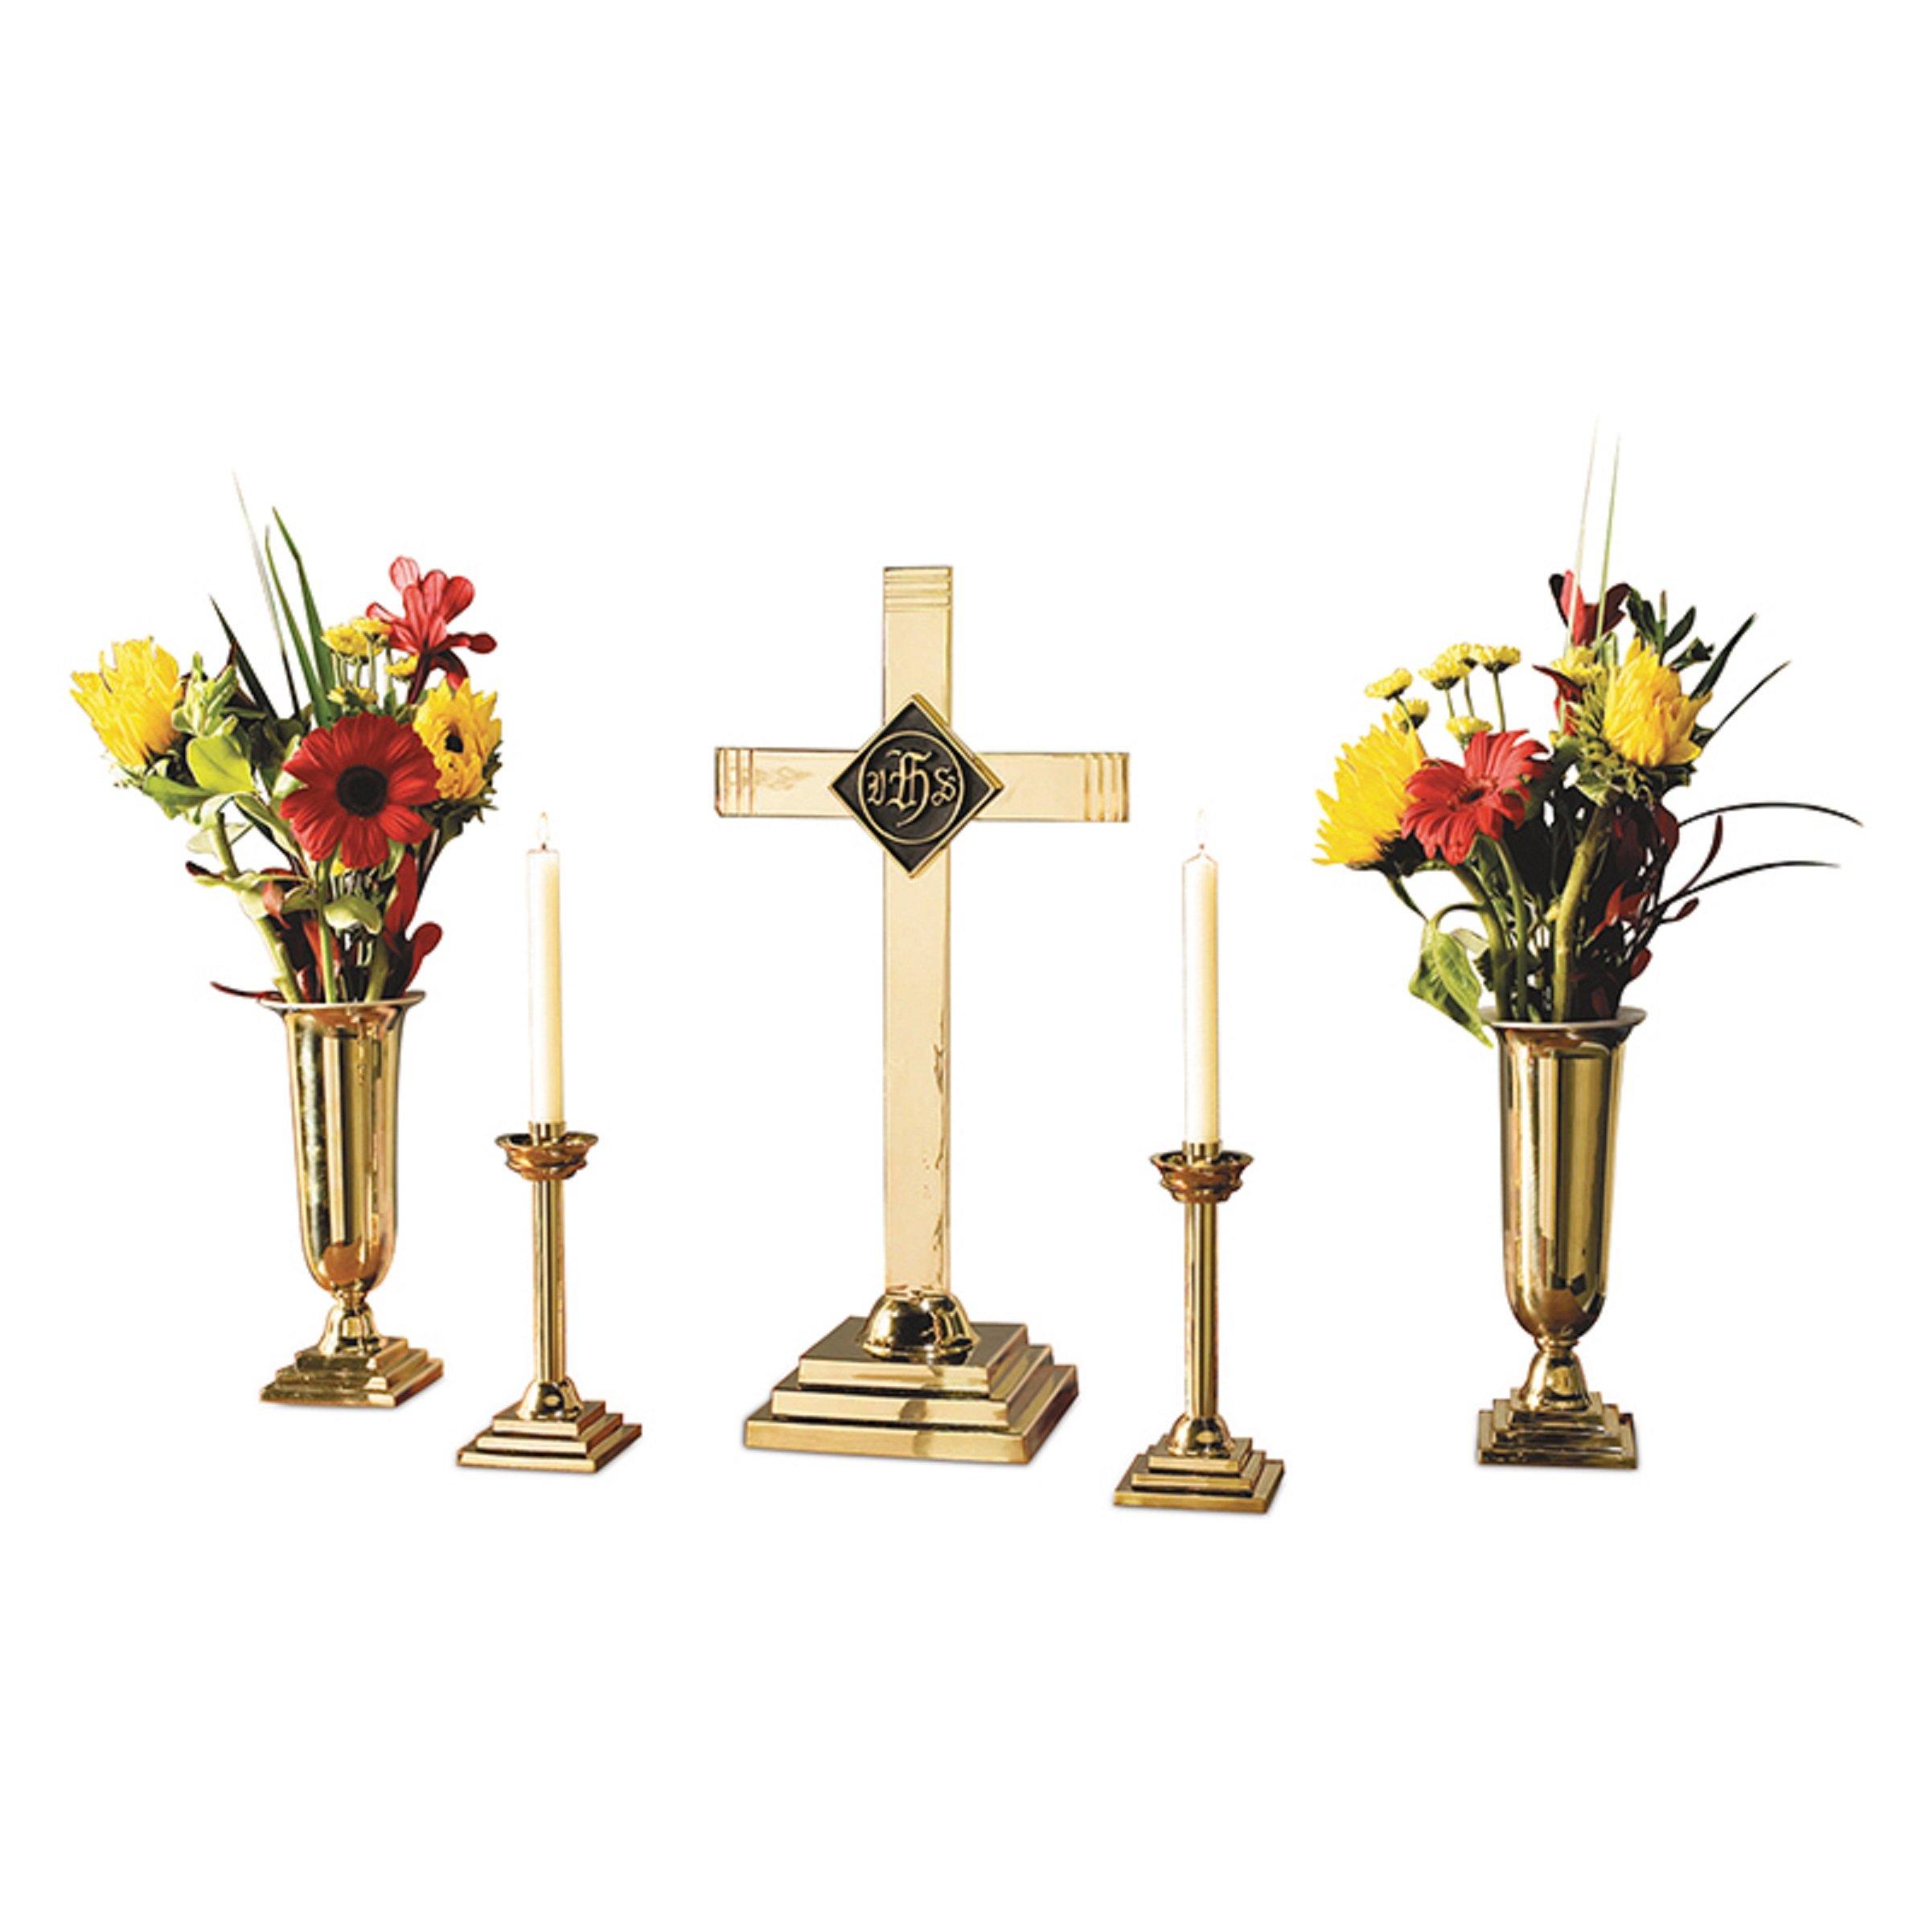 Christian Brands Church Supply LC915 5 Piece Brass Altar Candle Set